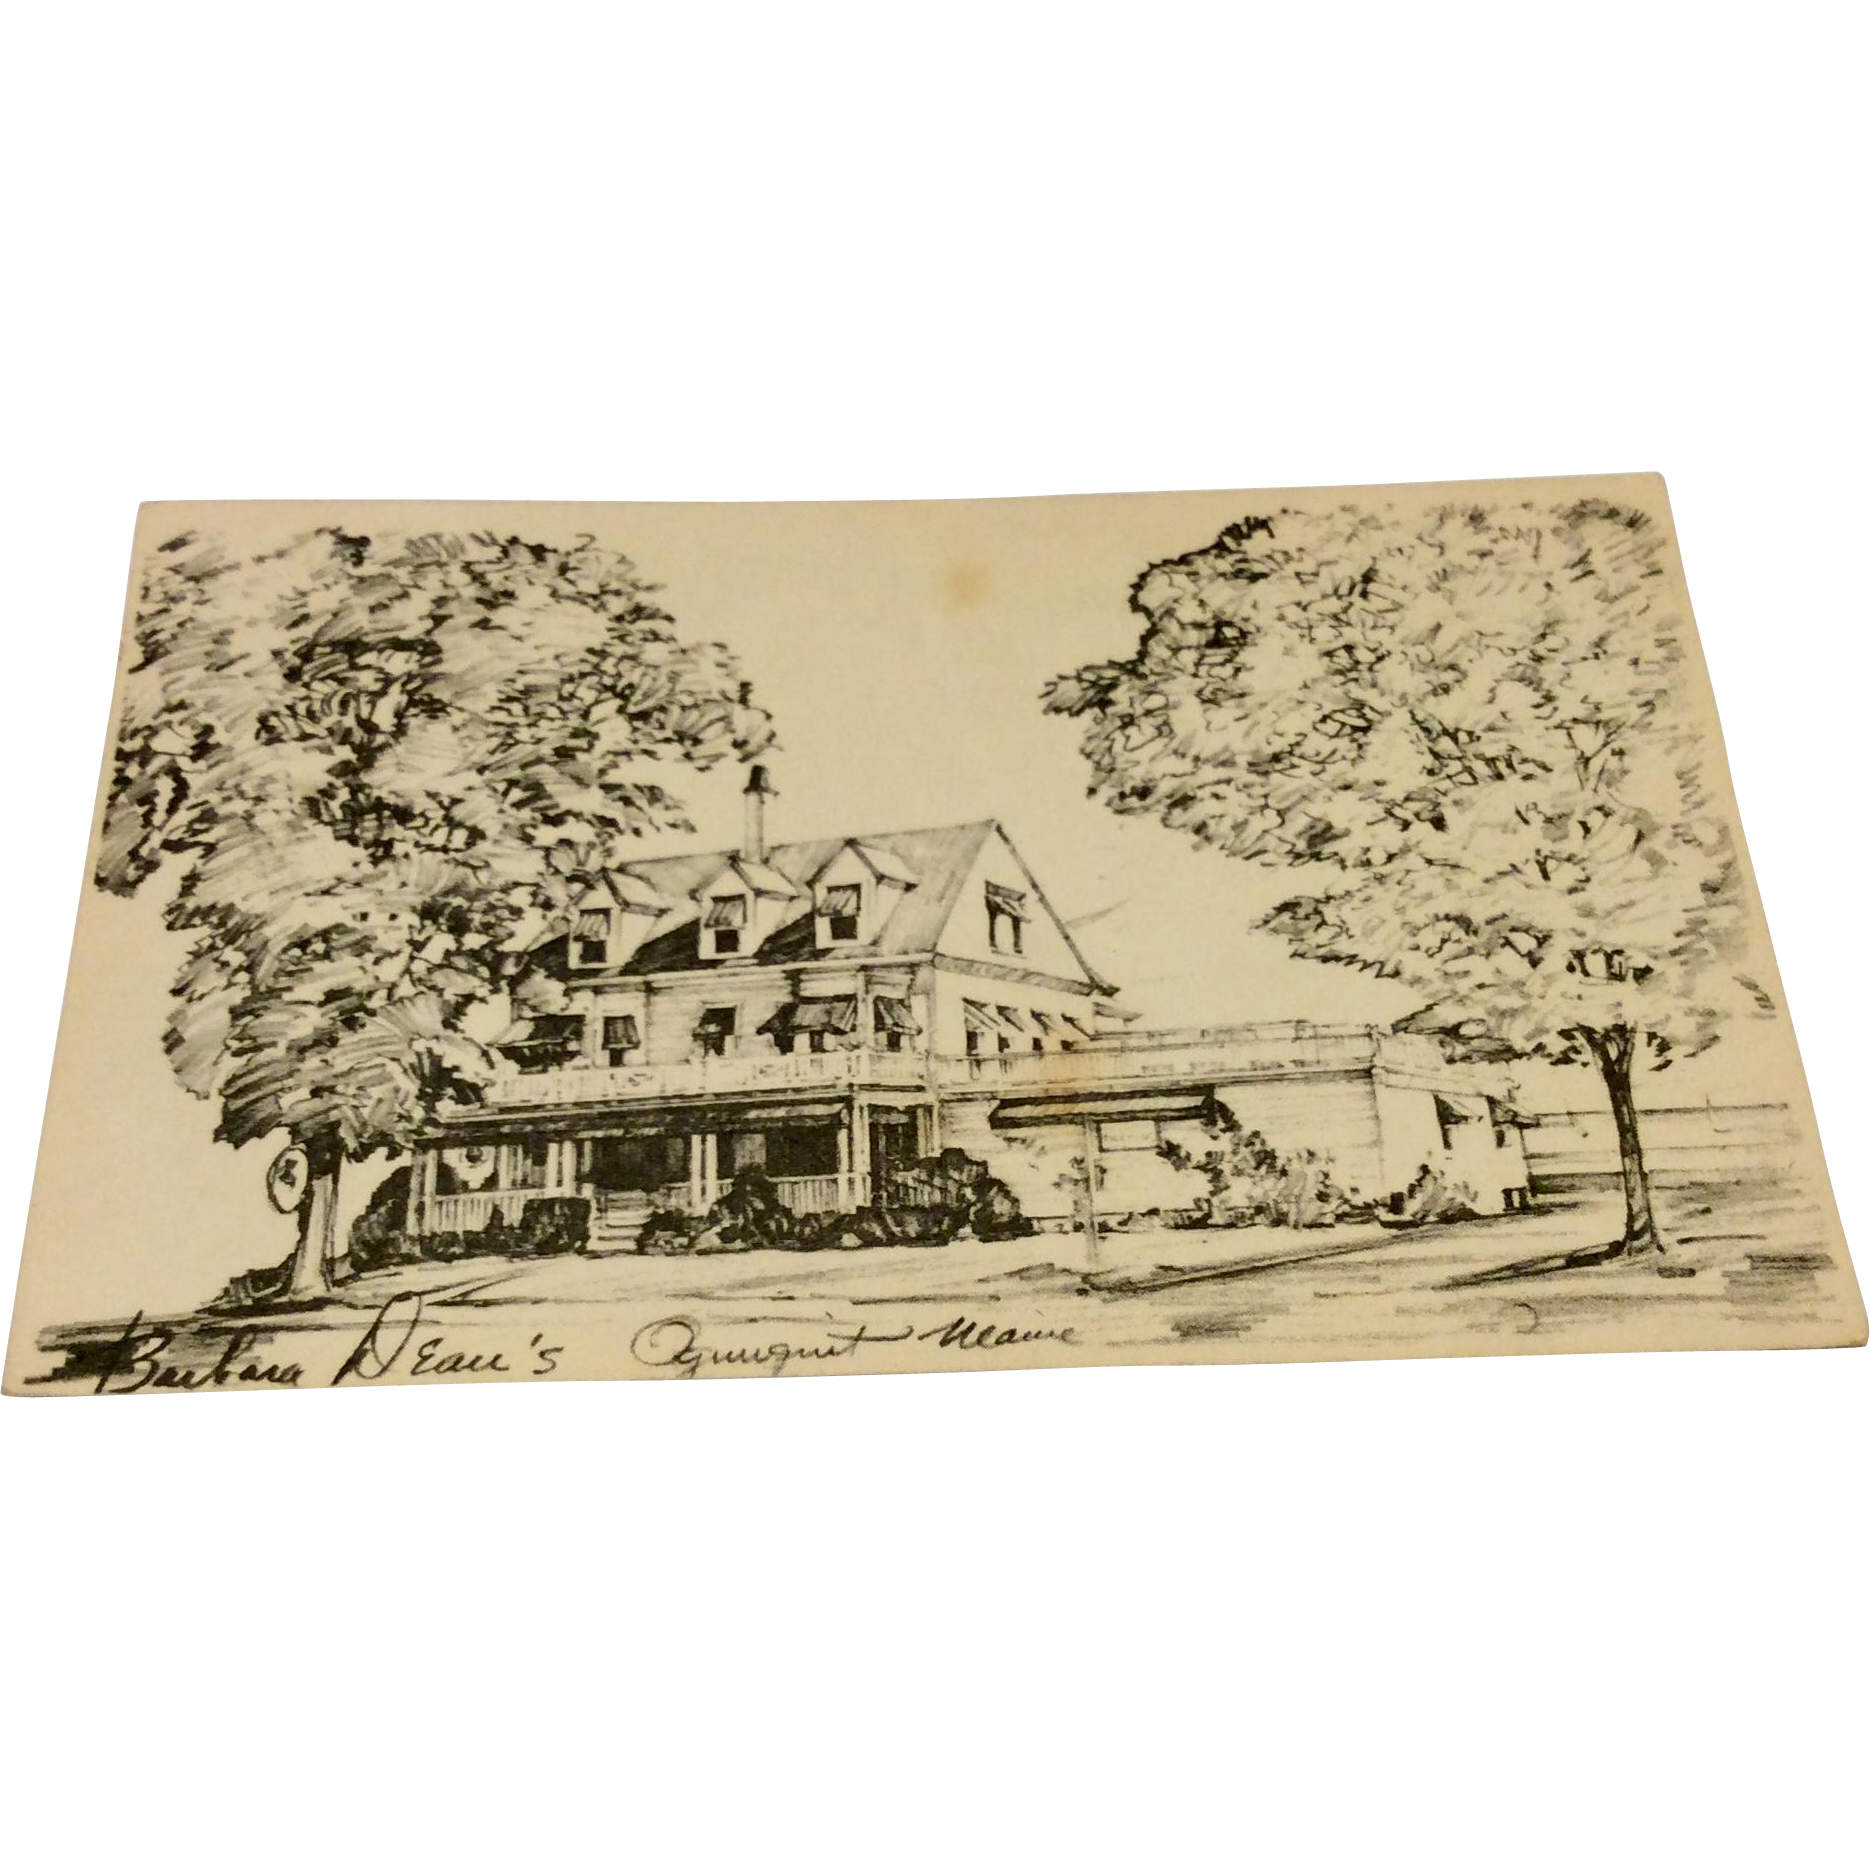 Vintage Advertising Postcard Barbara Deau's Ogunquit, Maine Postcard